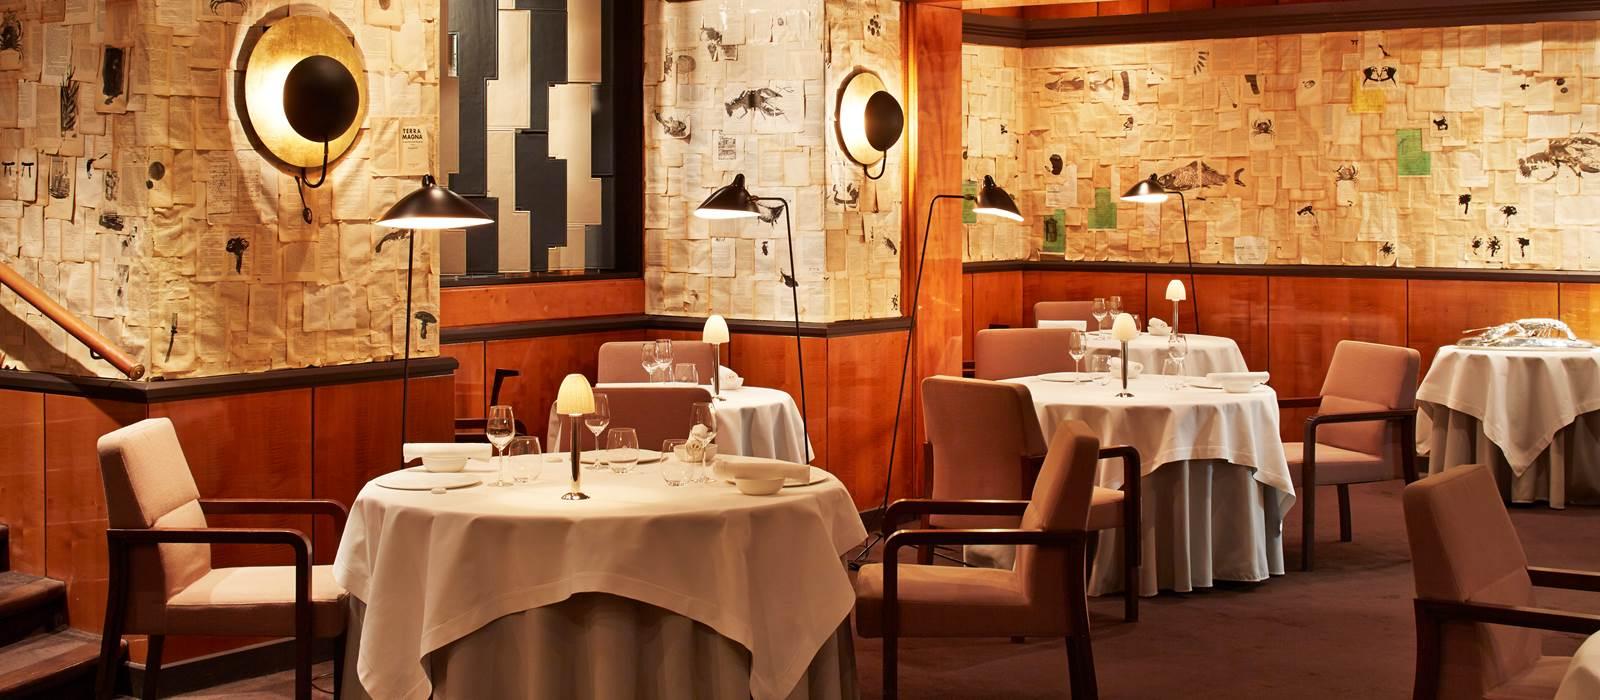 Restaurant pierre gagnaire 3 toiles michelin h tel balzac for Restaurant la cuisine dax